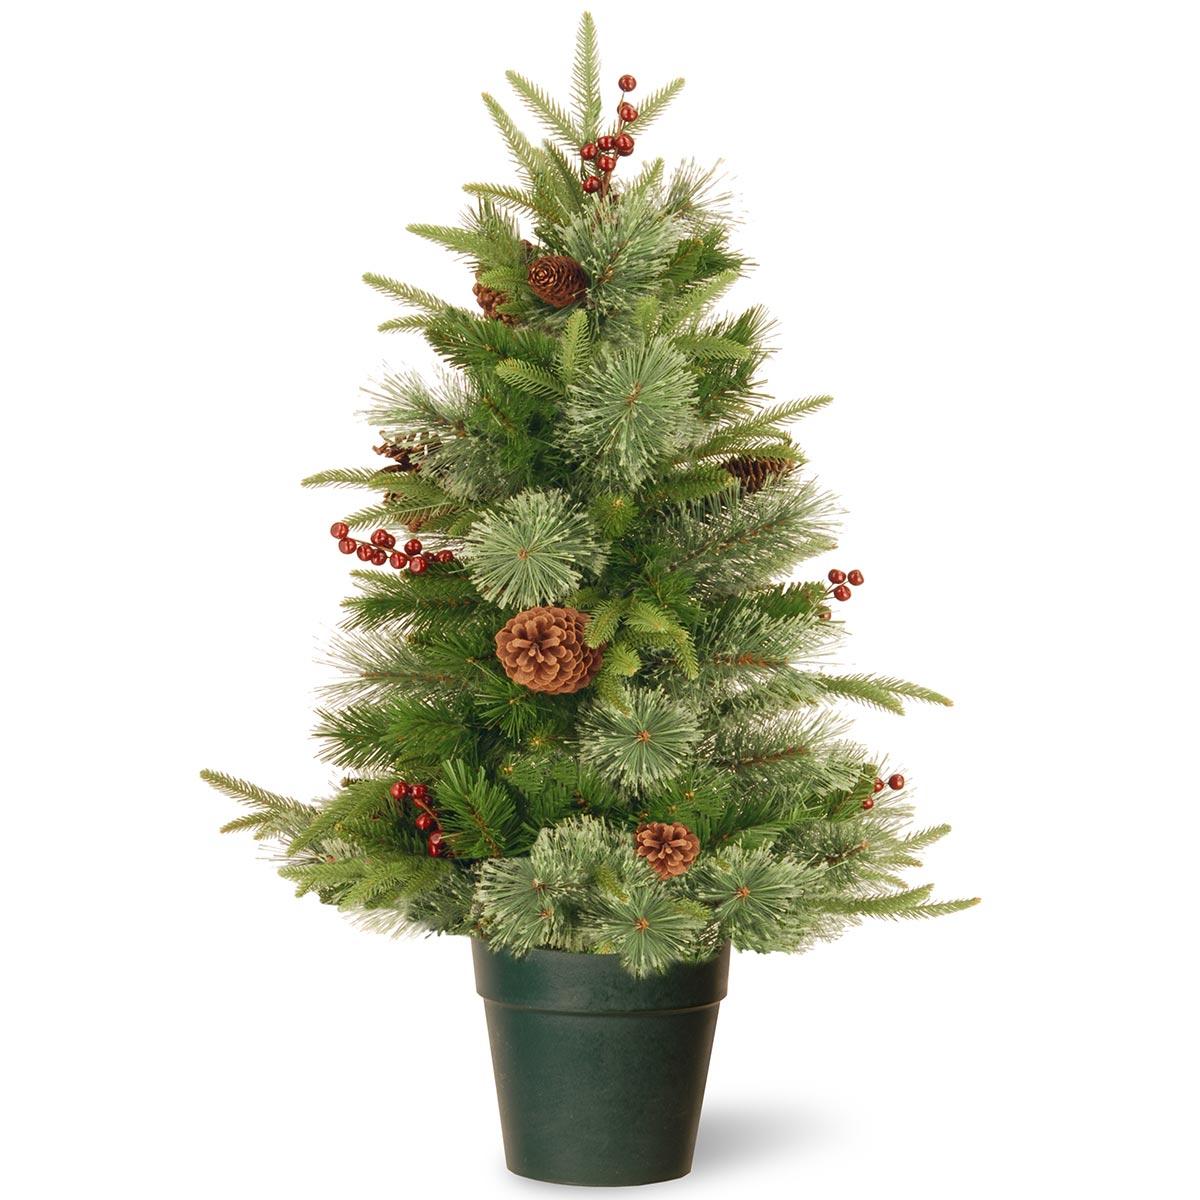 7ft Fibre Optic Christmas Tree